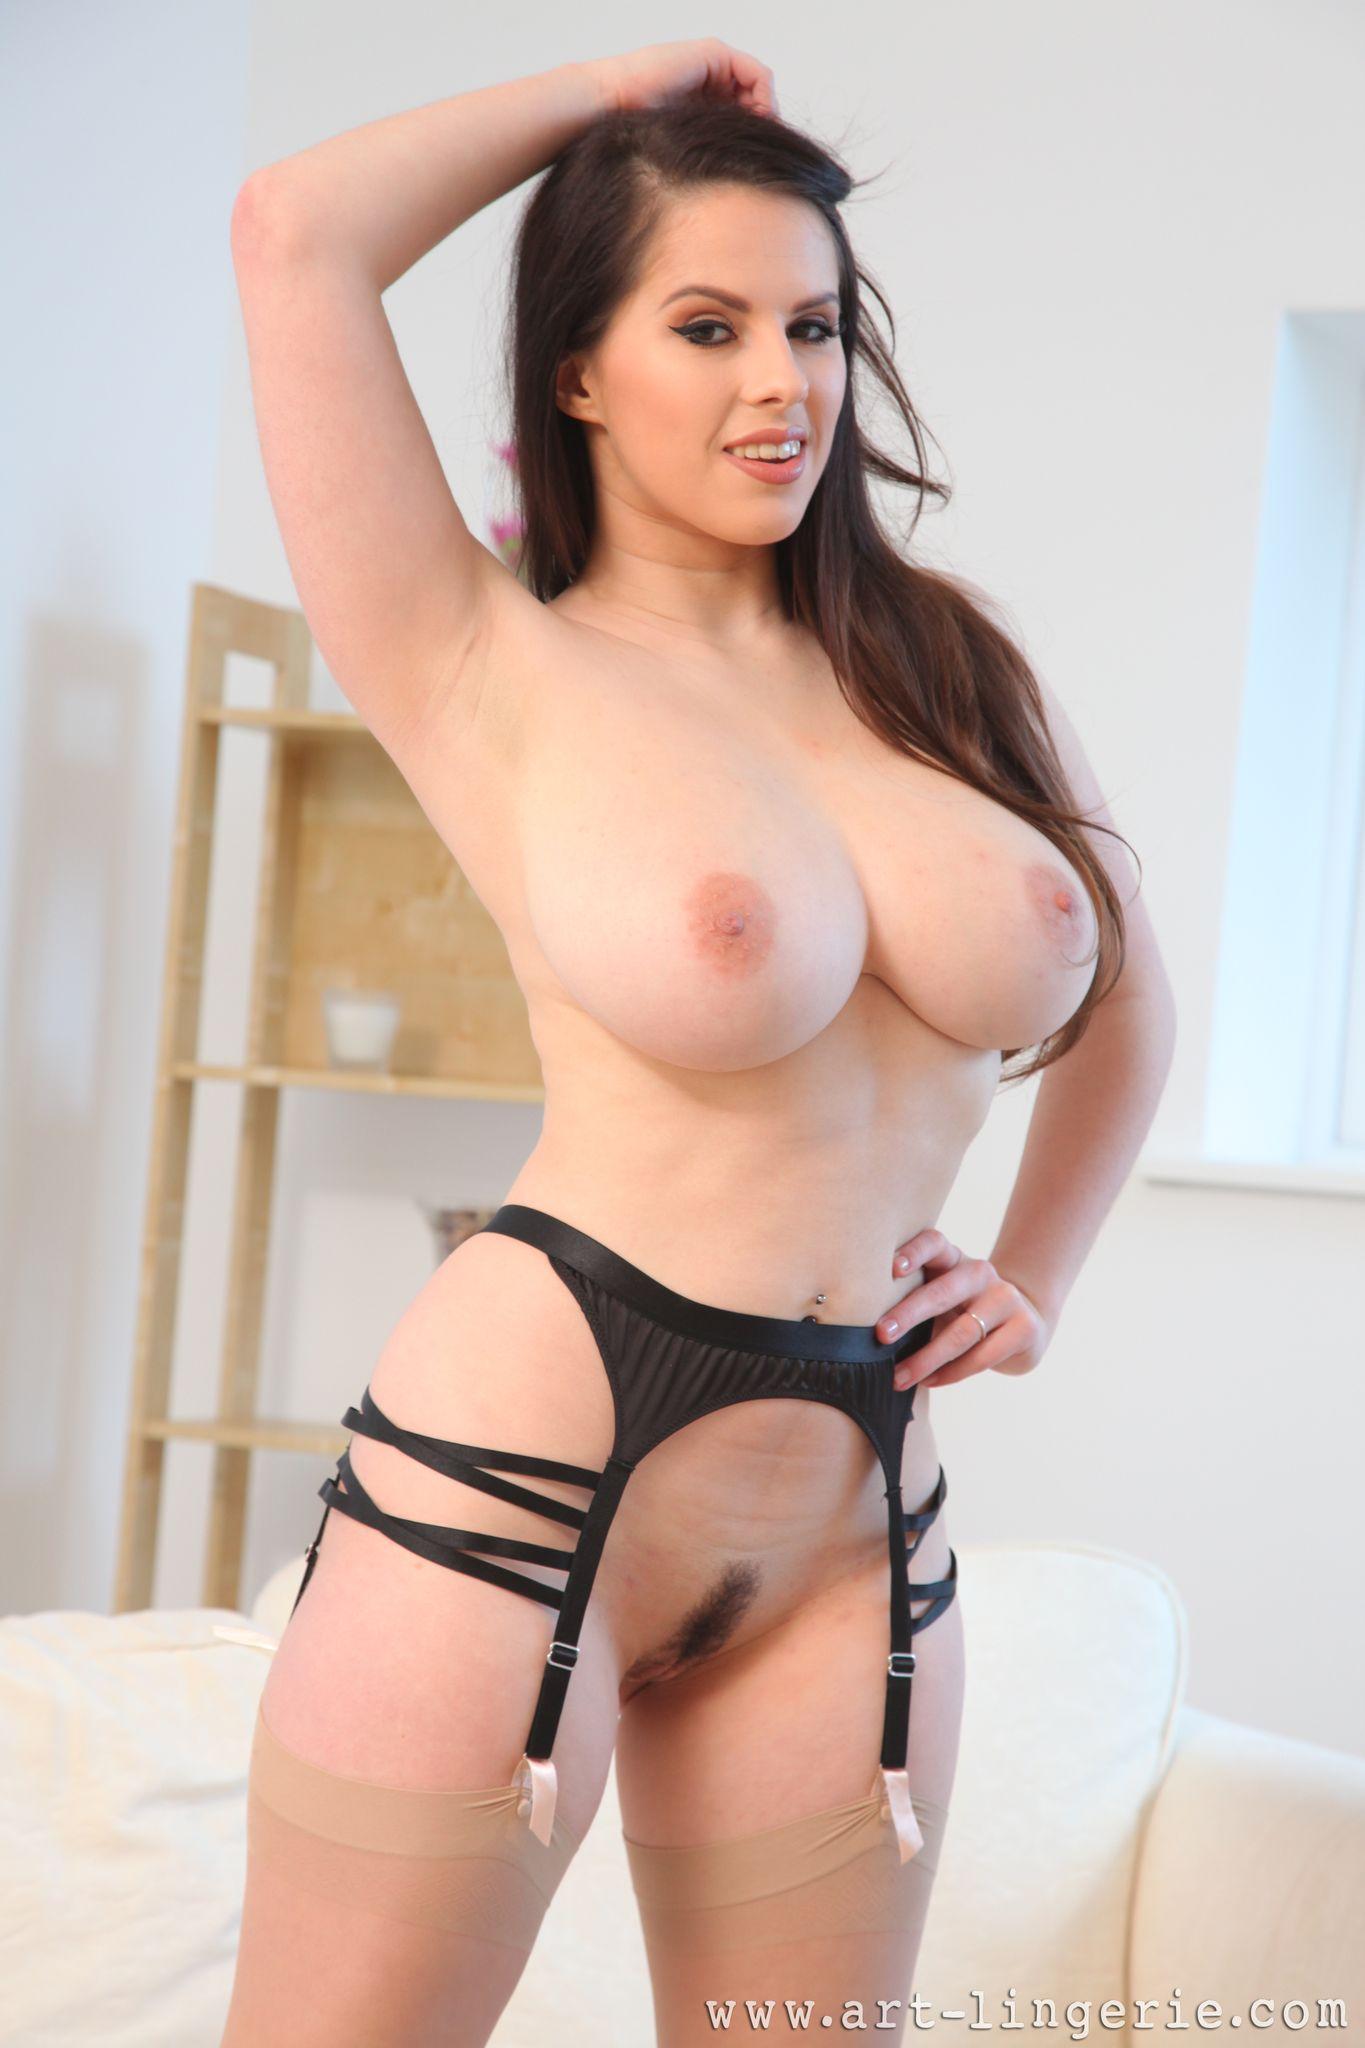 This curvy girl will fuck anyone 2